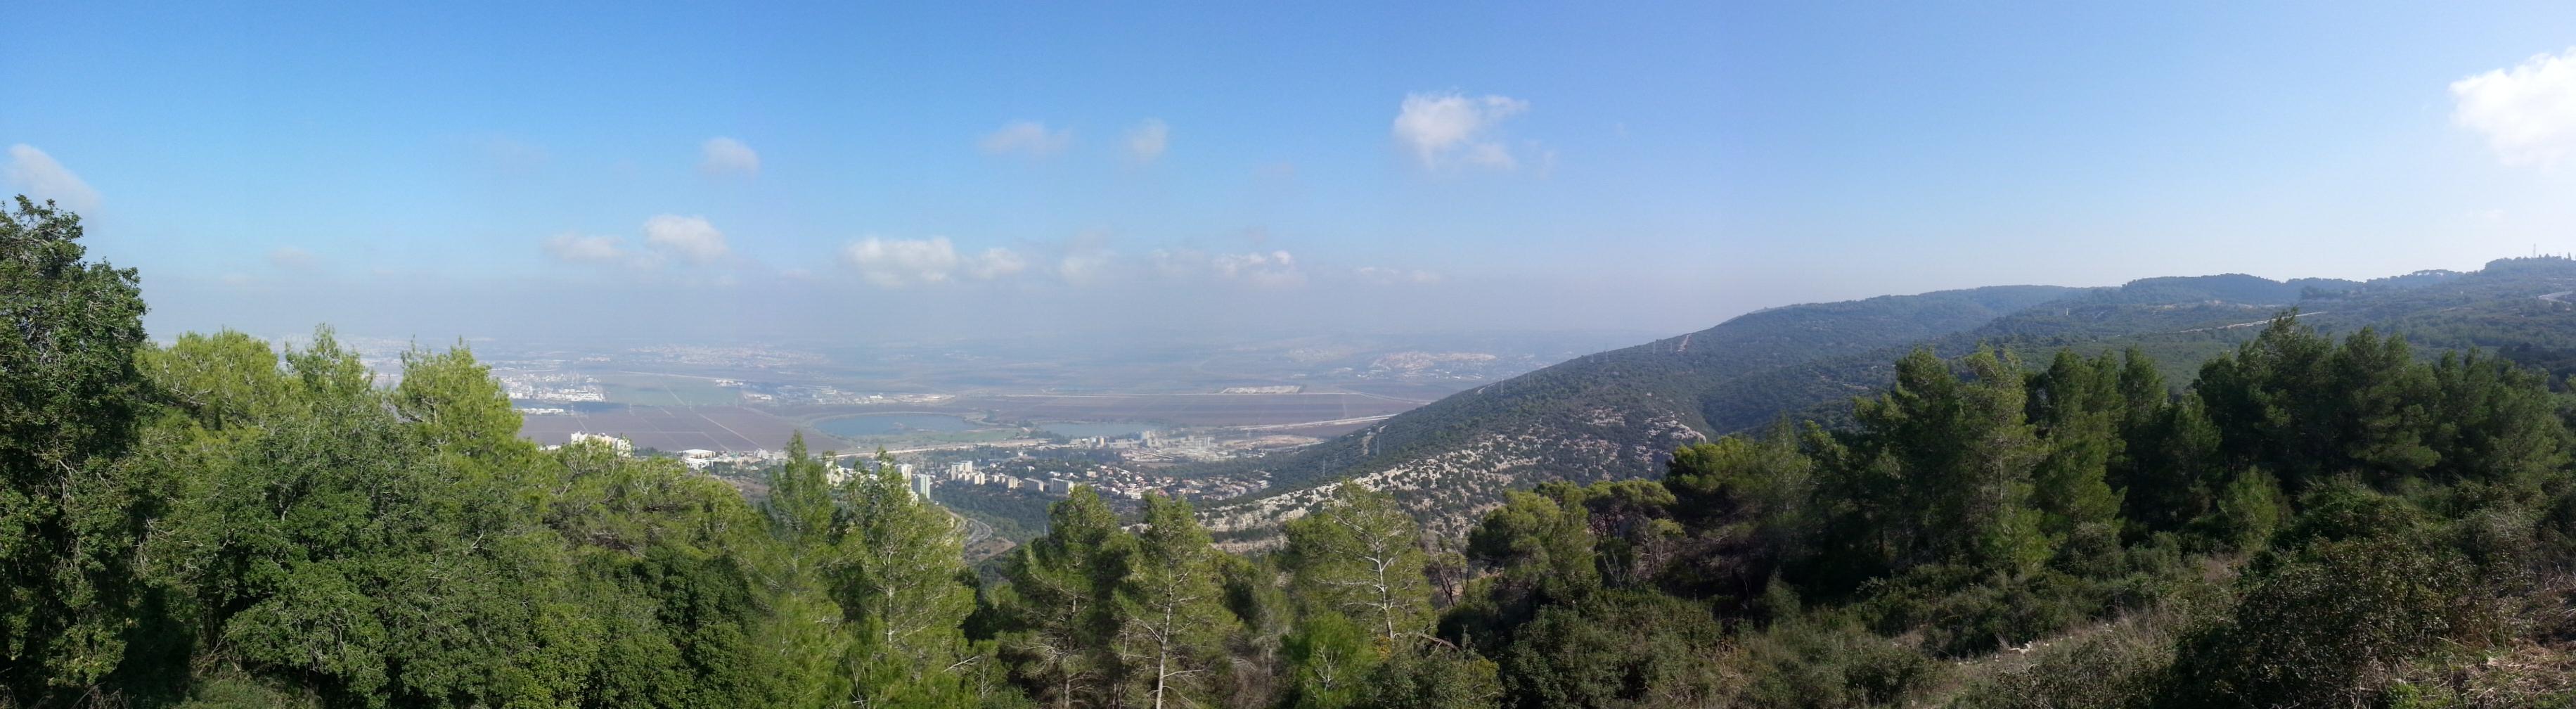 View over Akko Valley from Mitzpe HaMifratz